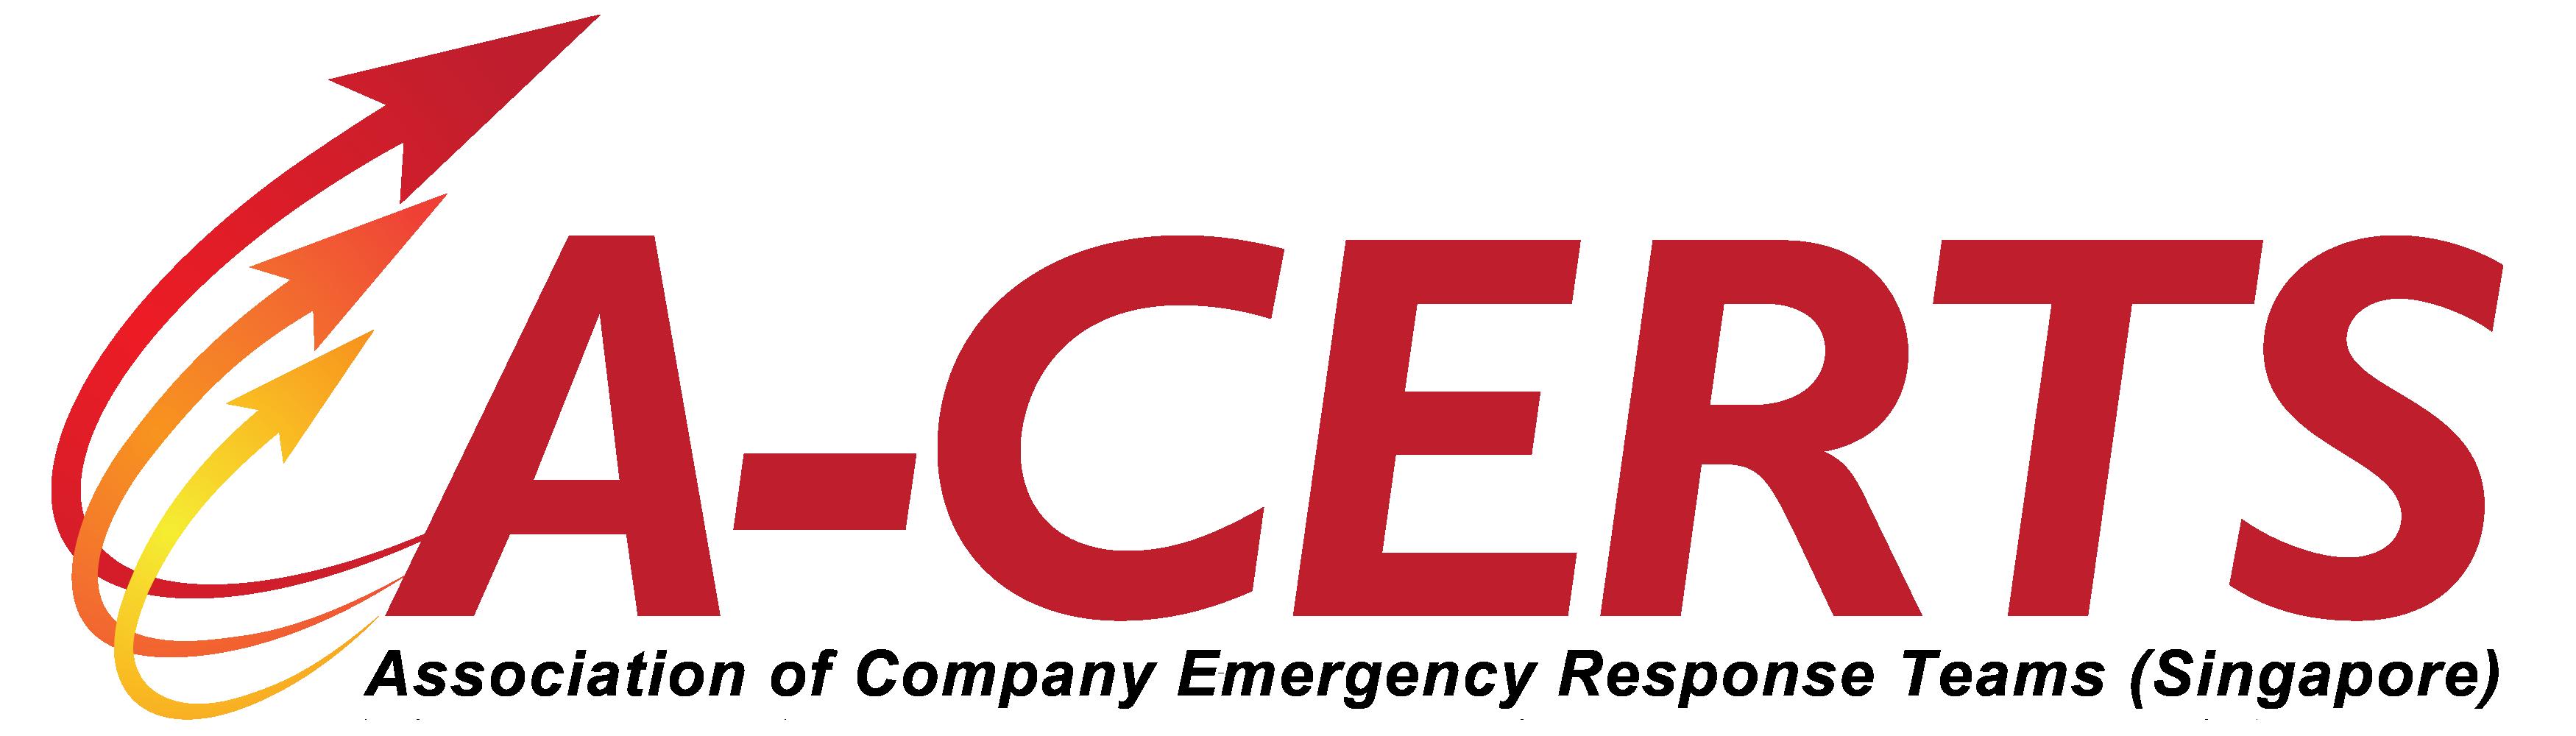 A-CERTS Logo